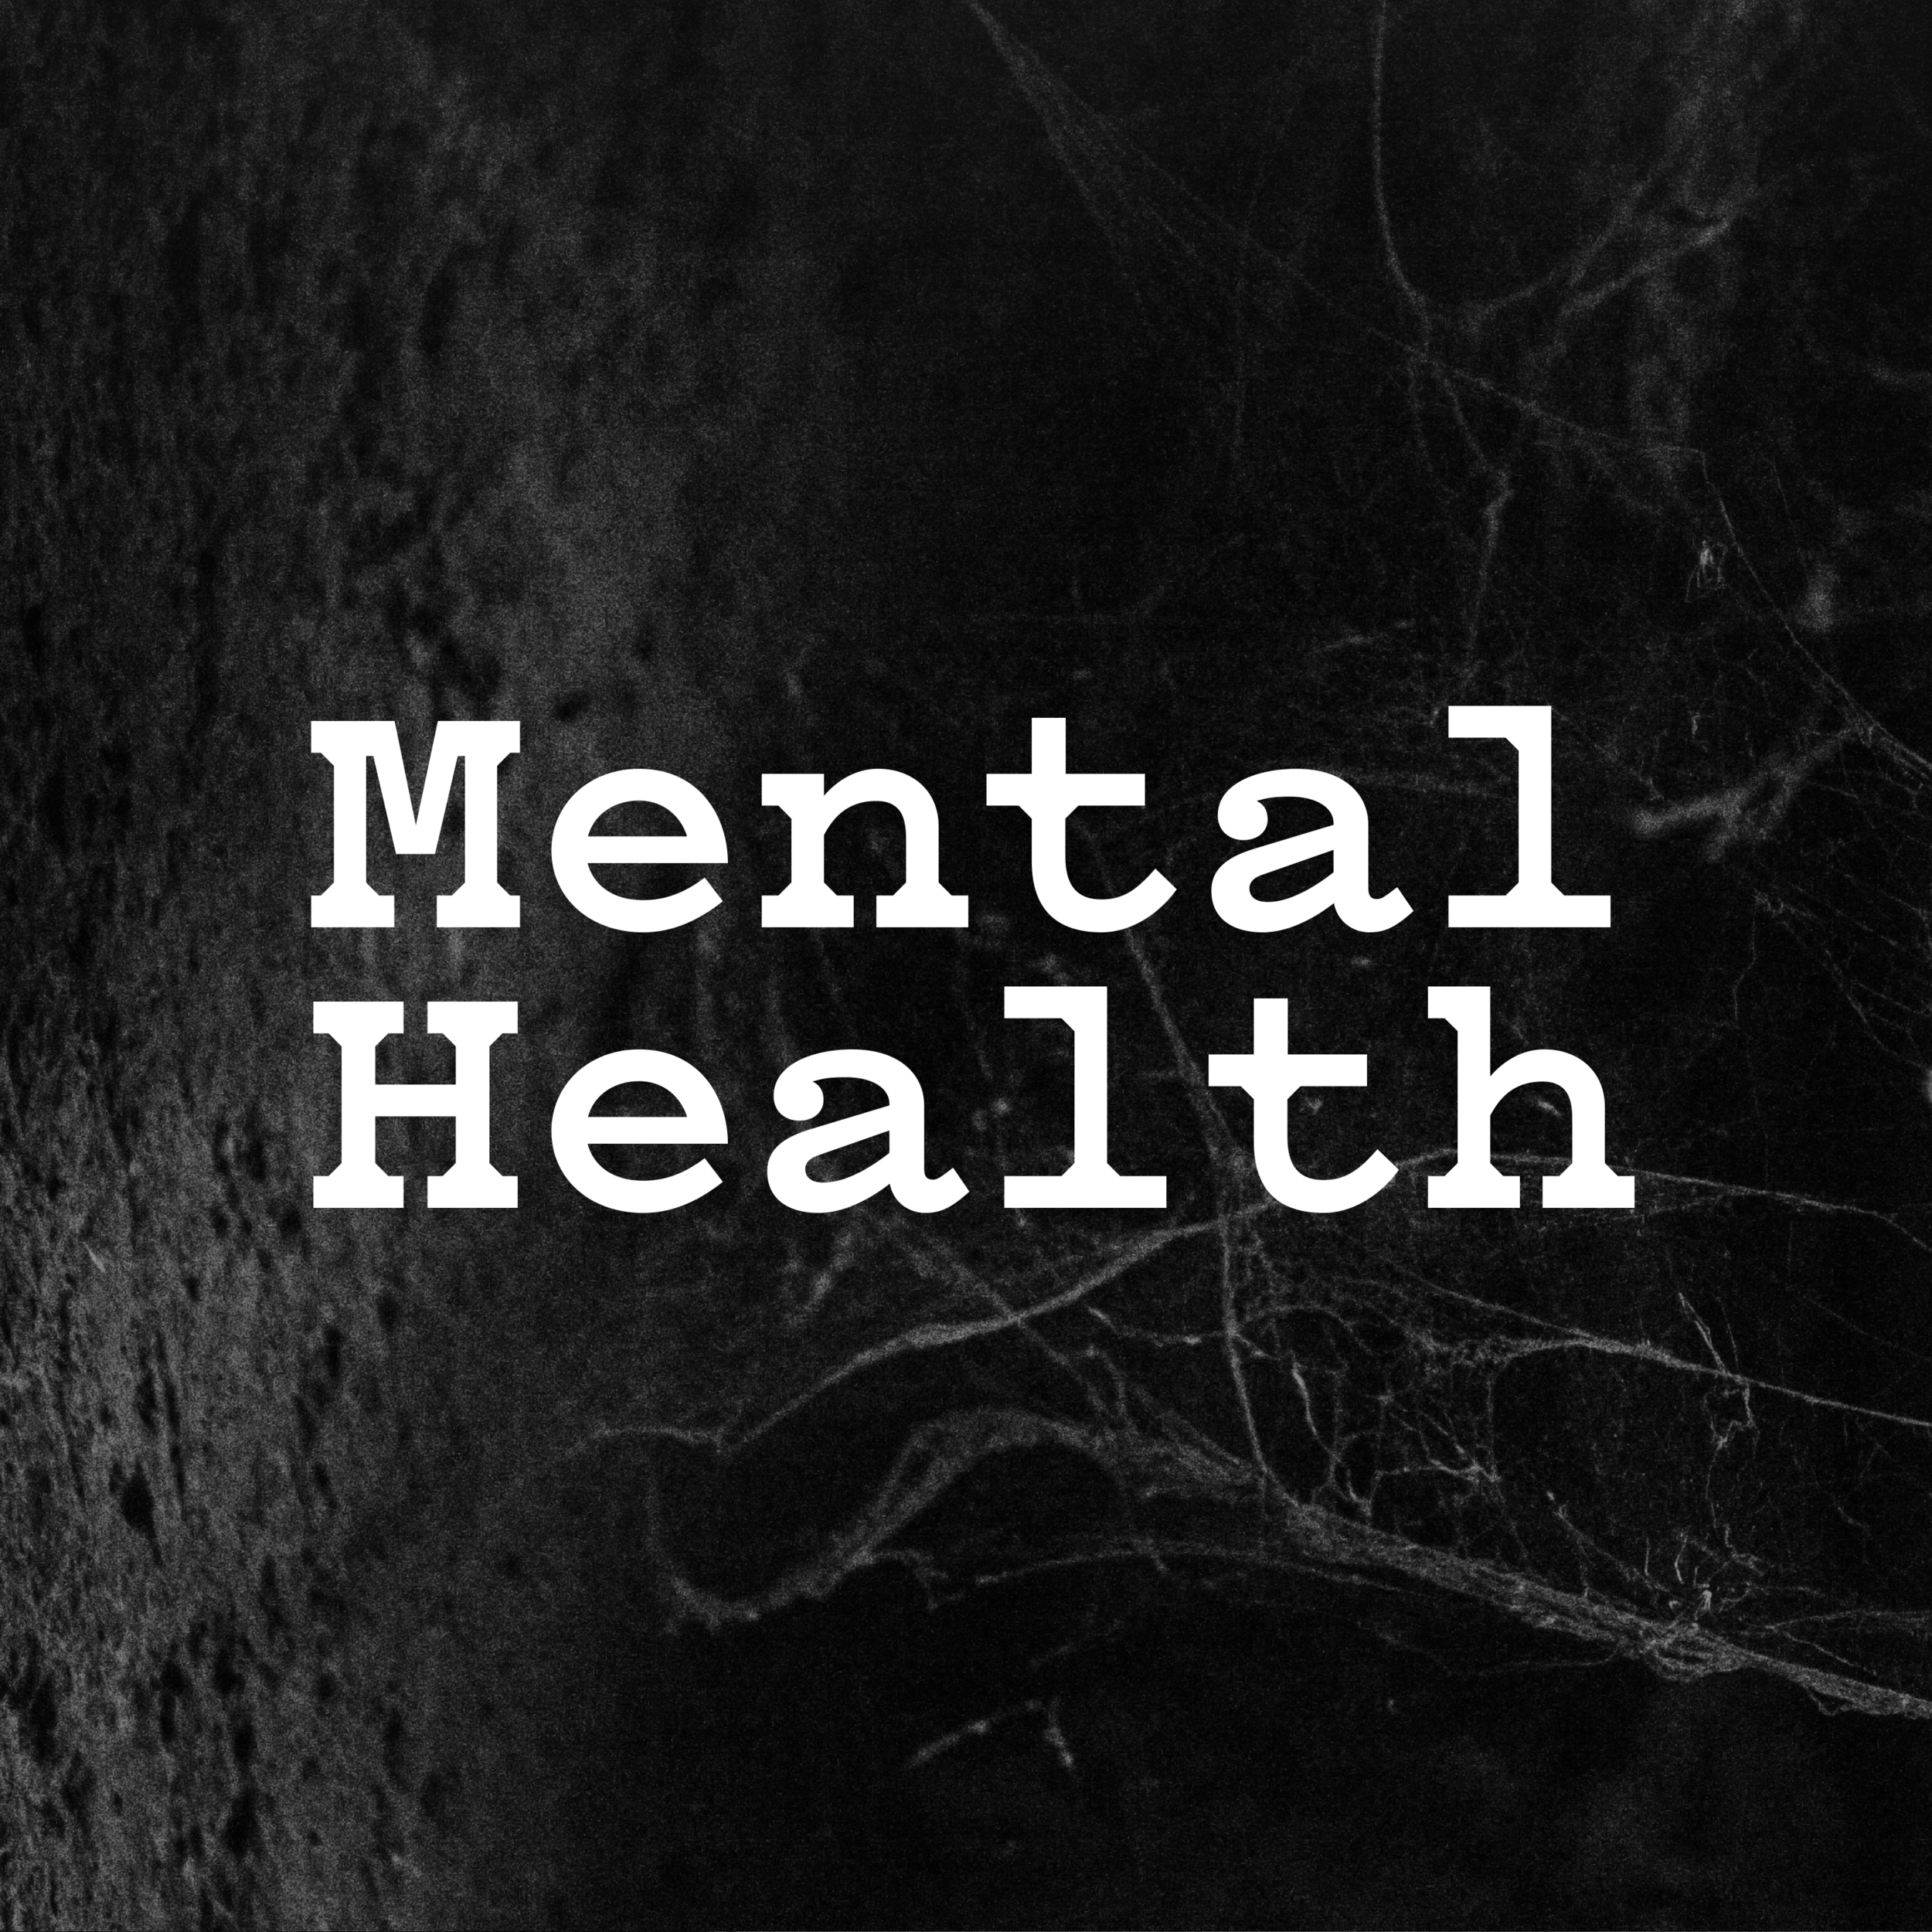 mentalhealthfinal.png